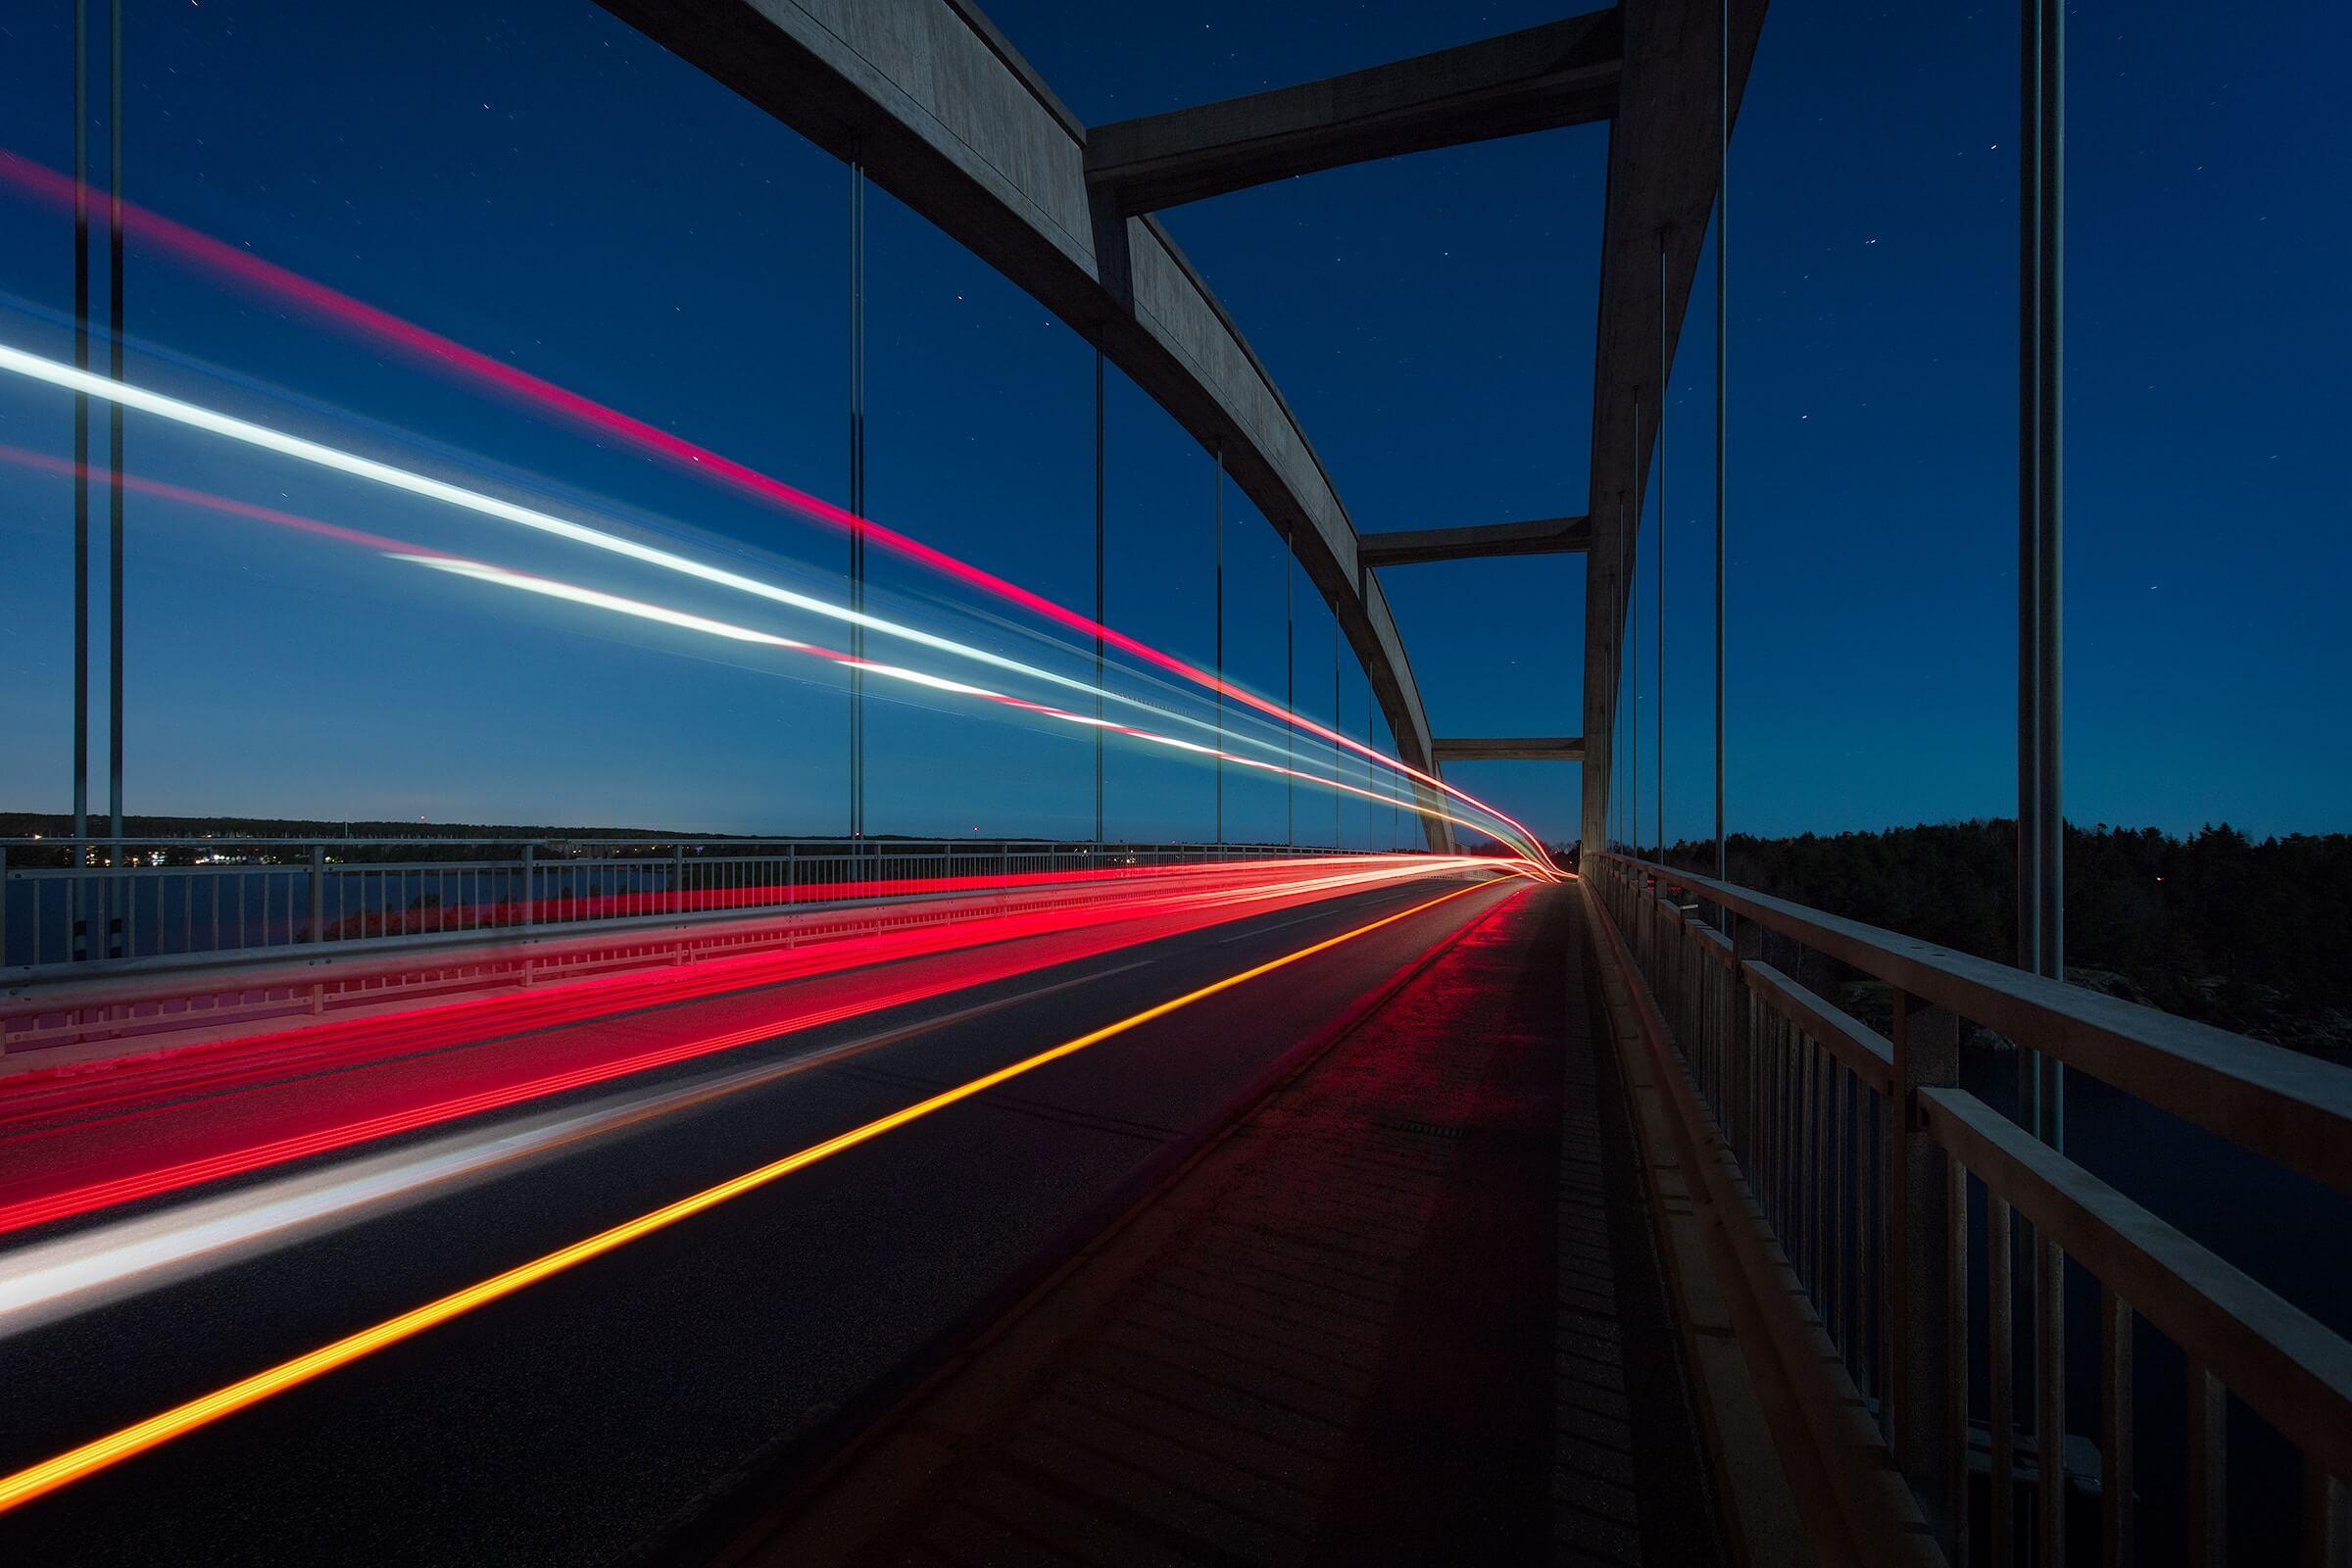 New Partnership Opens Door to Faster Enterprise Innovation Strategies